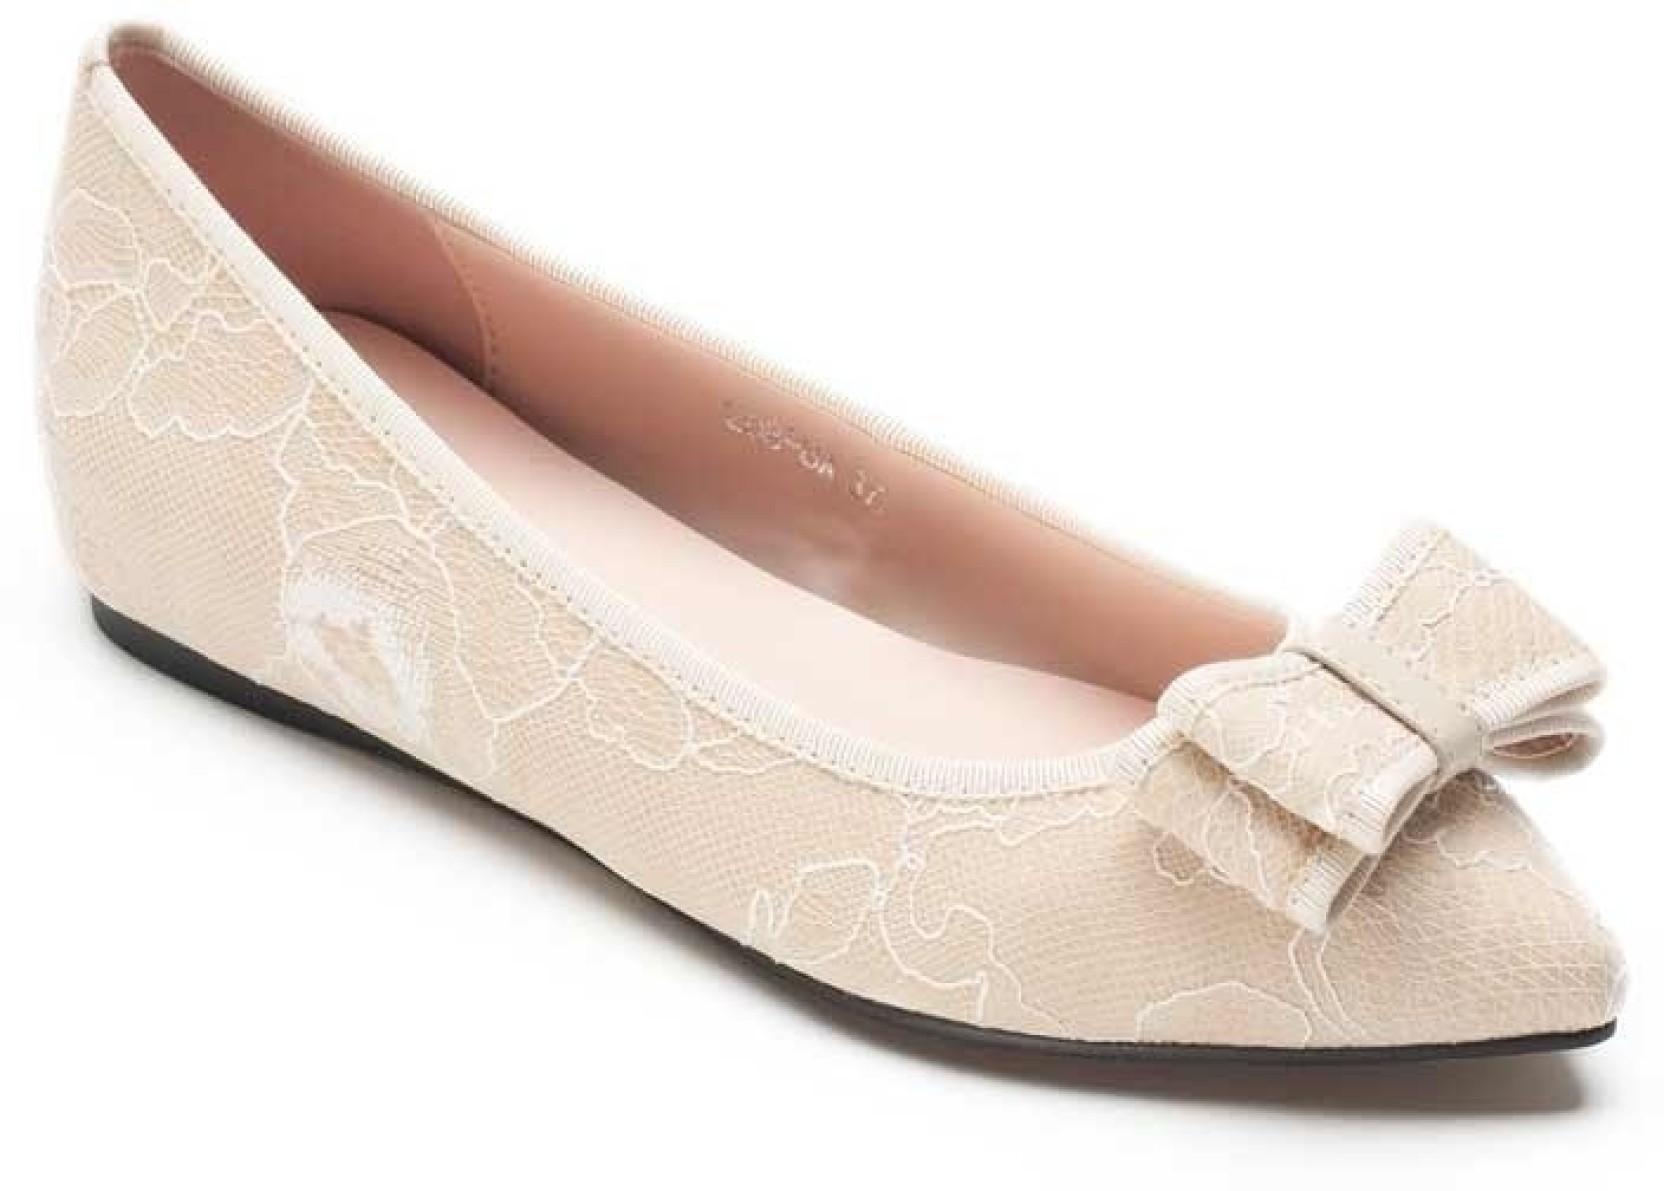 88ac1cbb6b5d47 Heel   Buckle Pazzion Pointed Toe Bellies For Women - Buy Beige ...